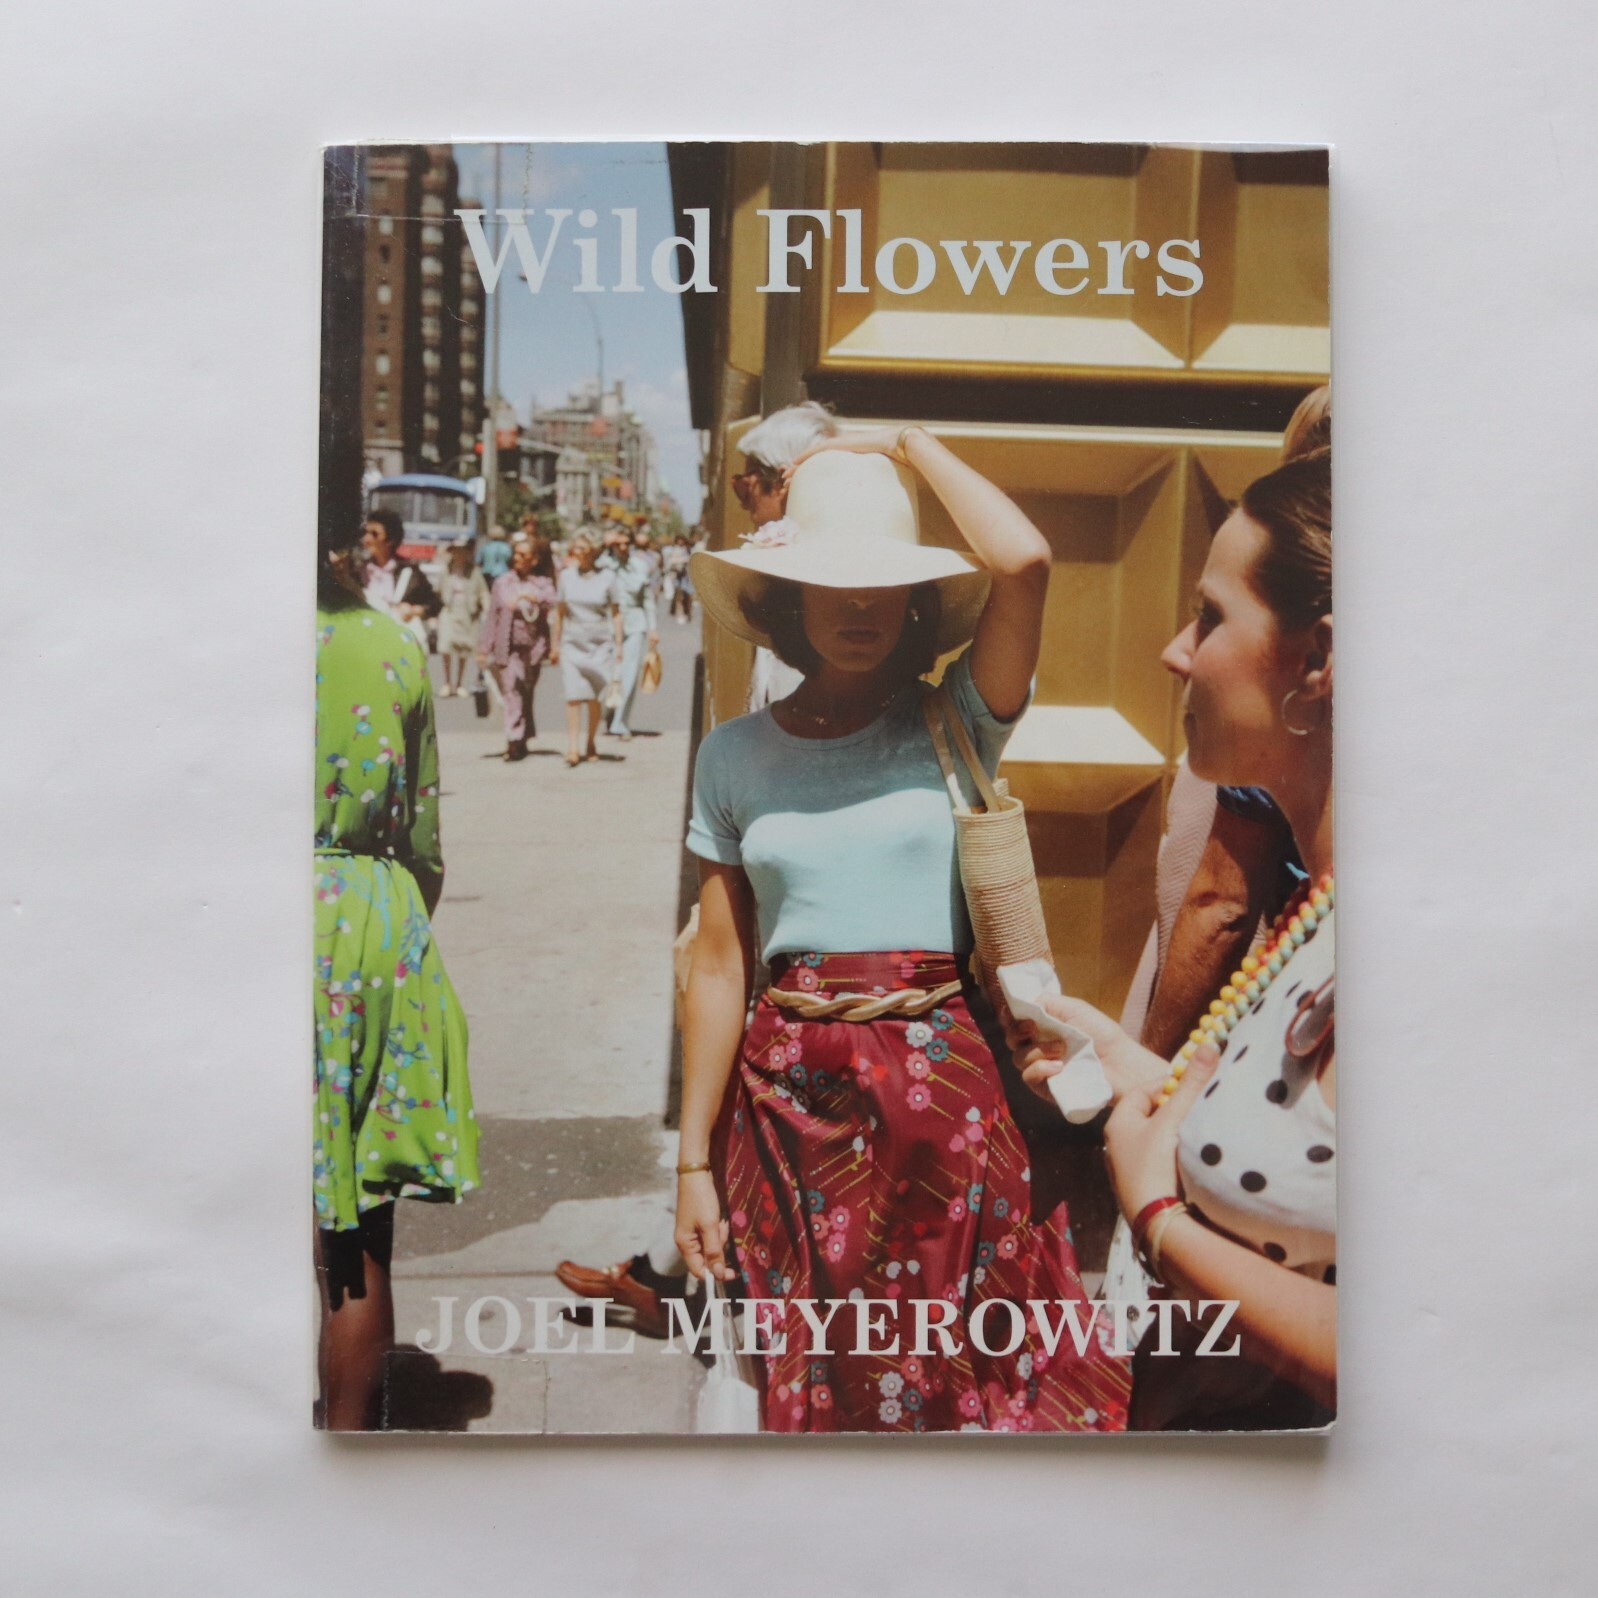 Wild Flowers / Joel Meyerowitz